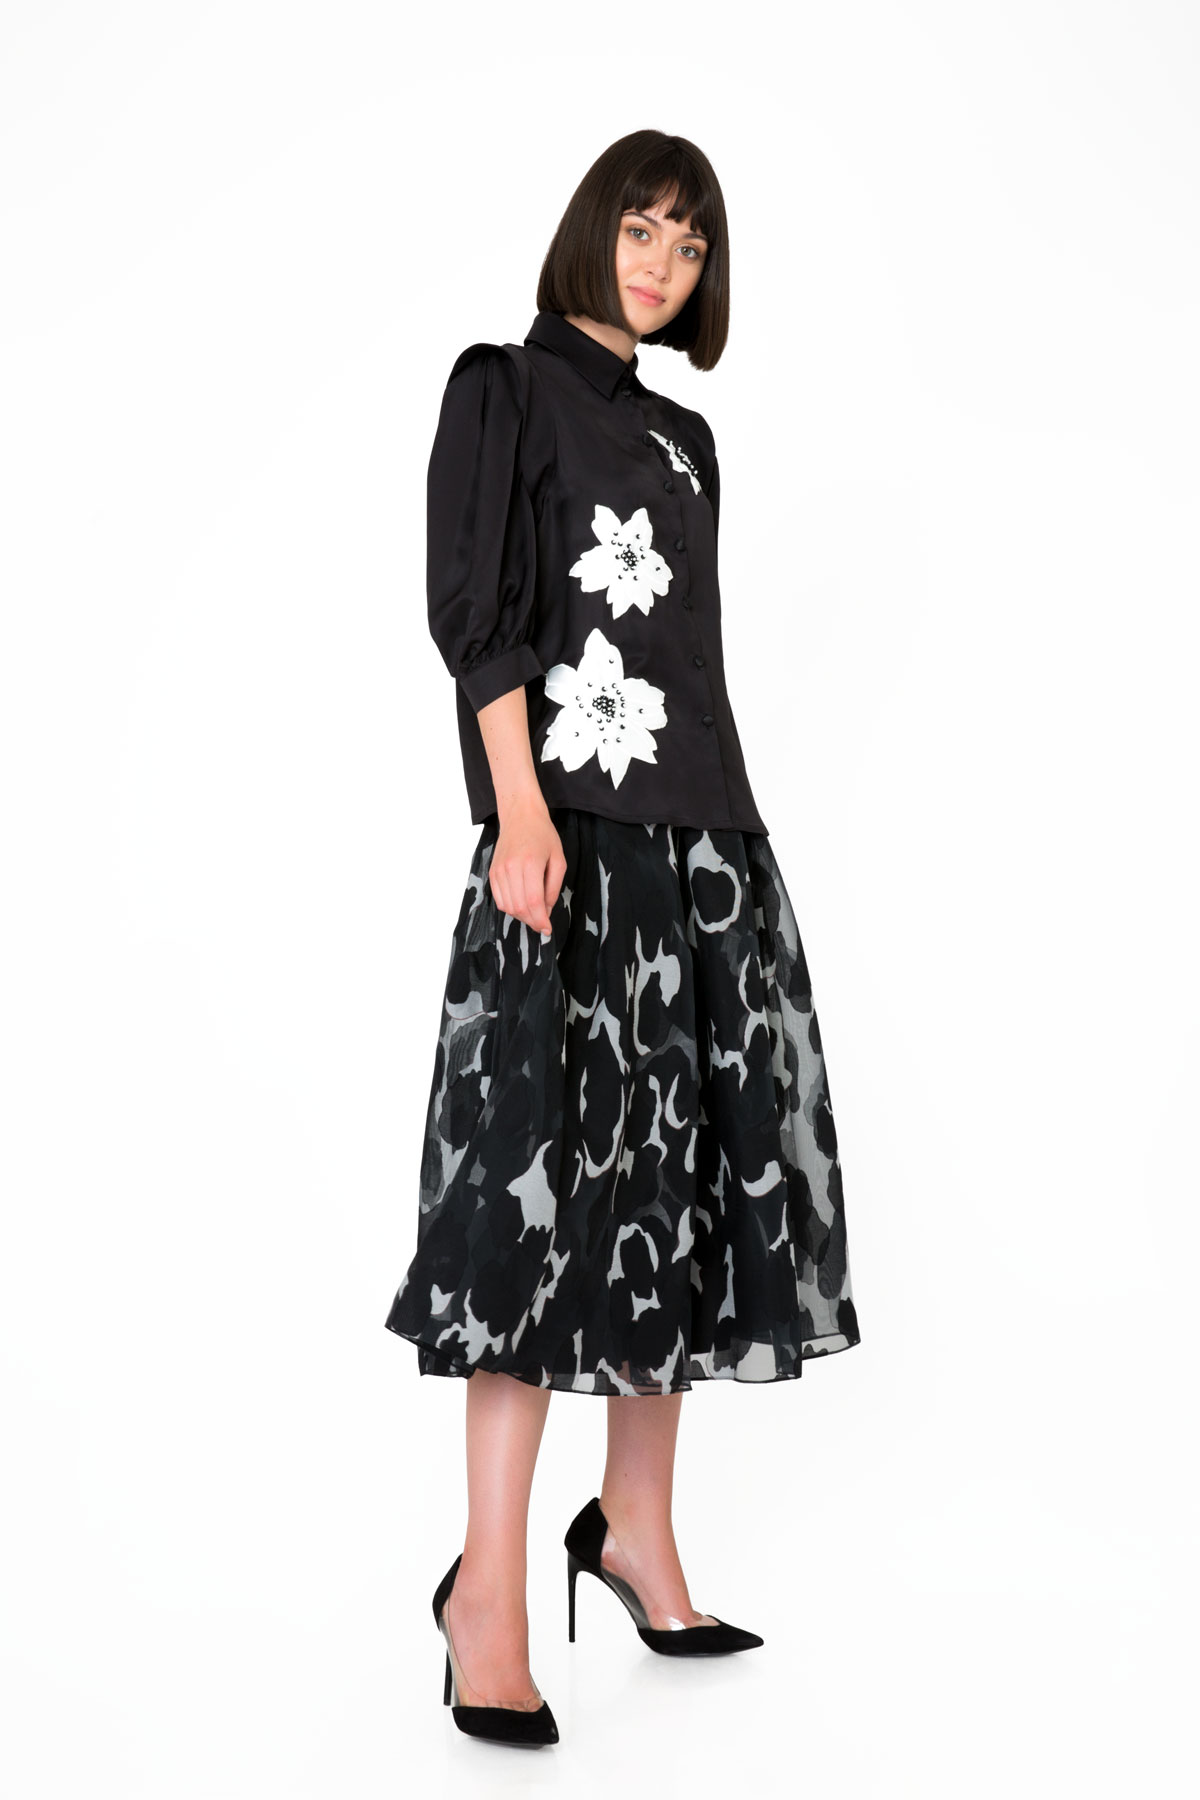 Embroidered Floral Detailed Black Shirt